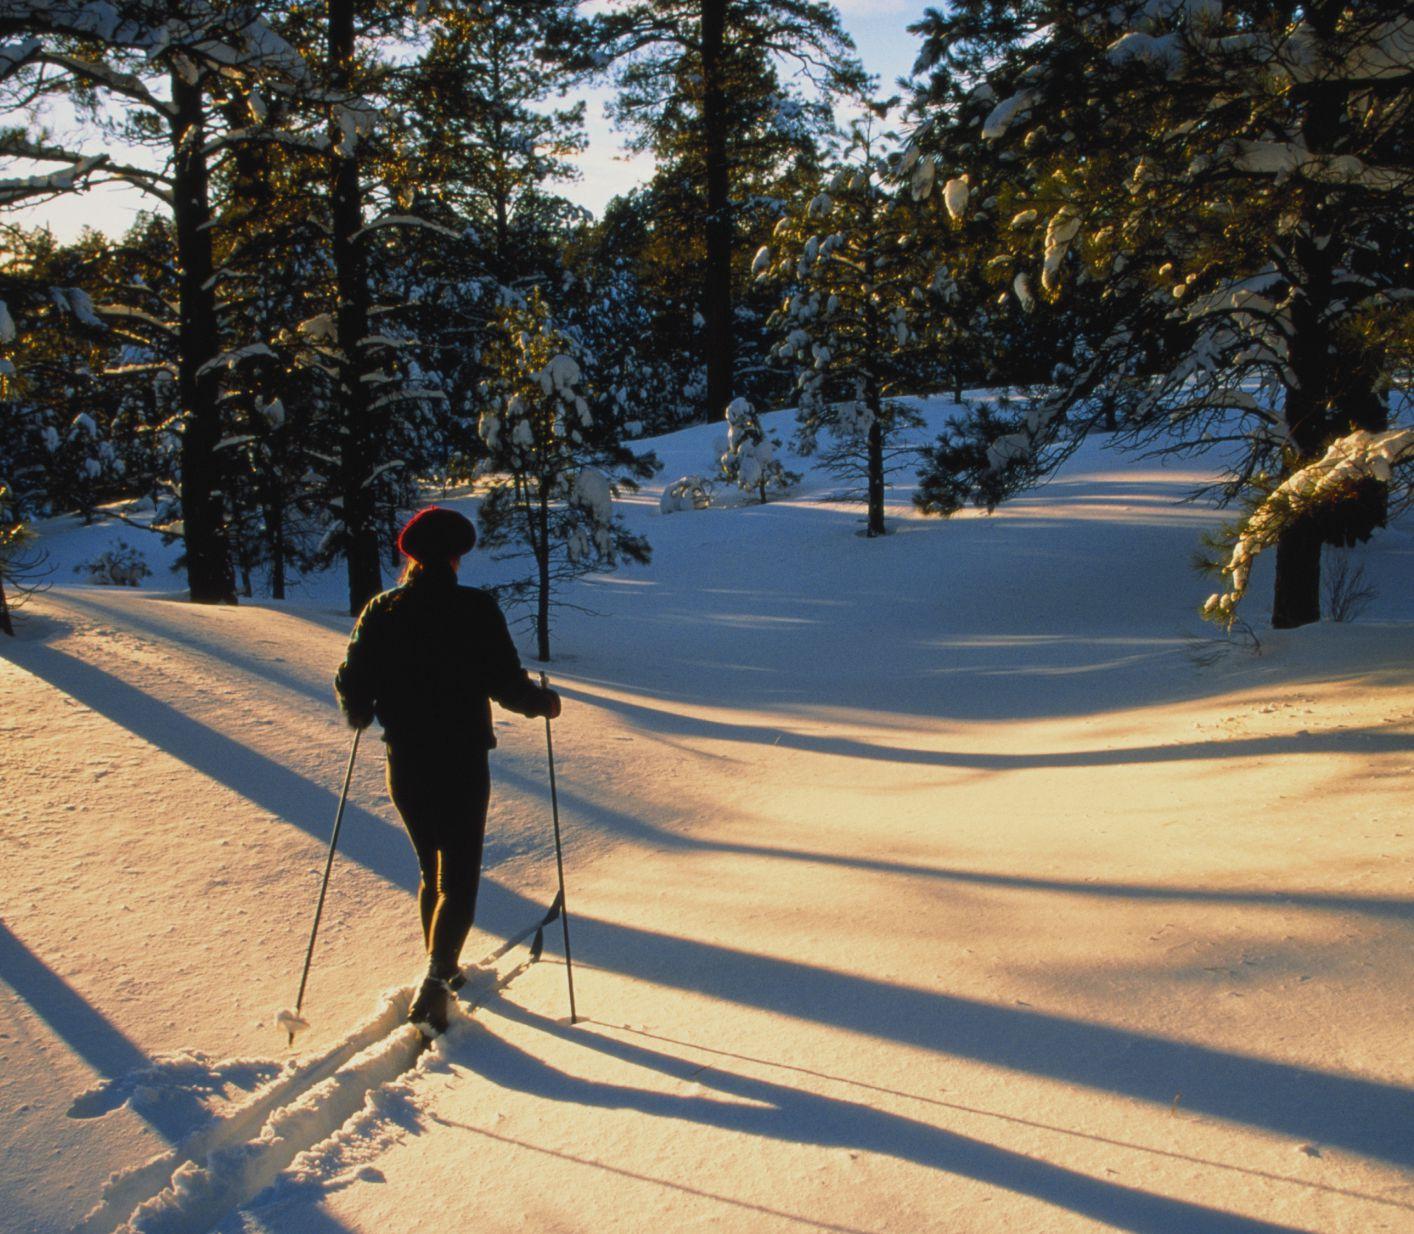 Where To Ski In Arizona Snowbowl Sunrise And More